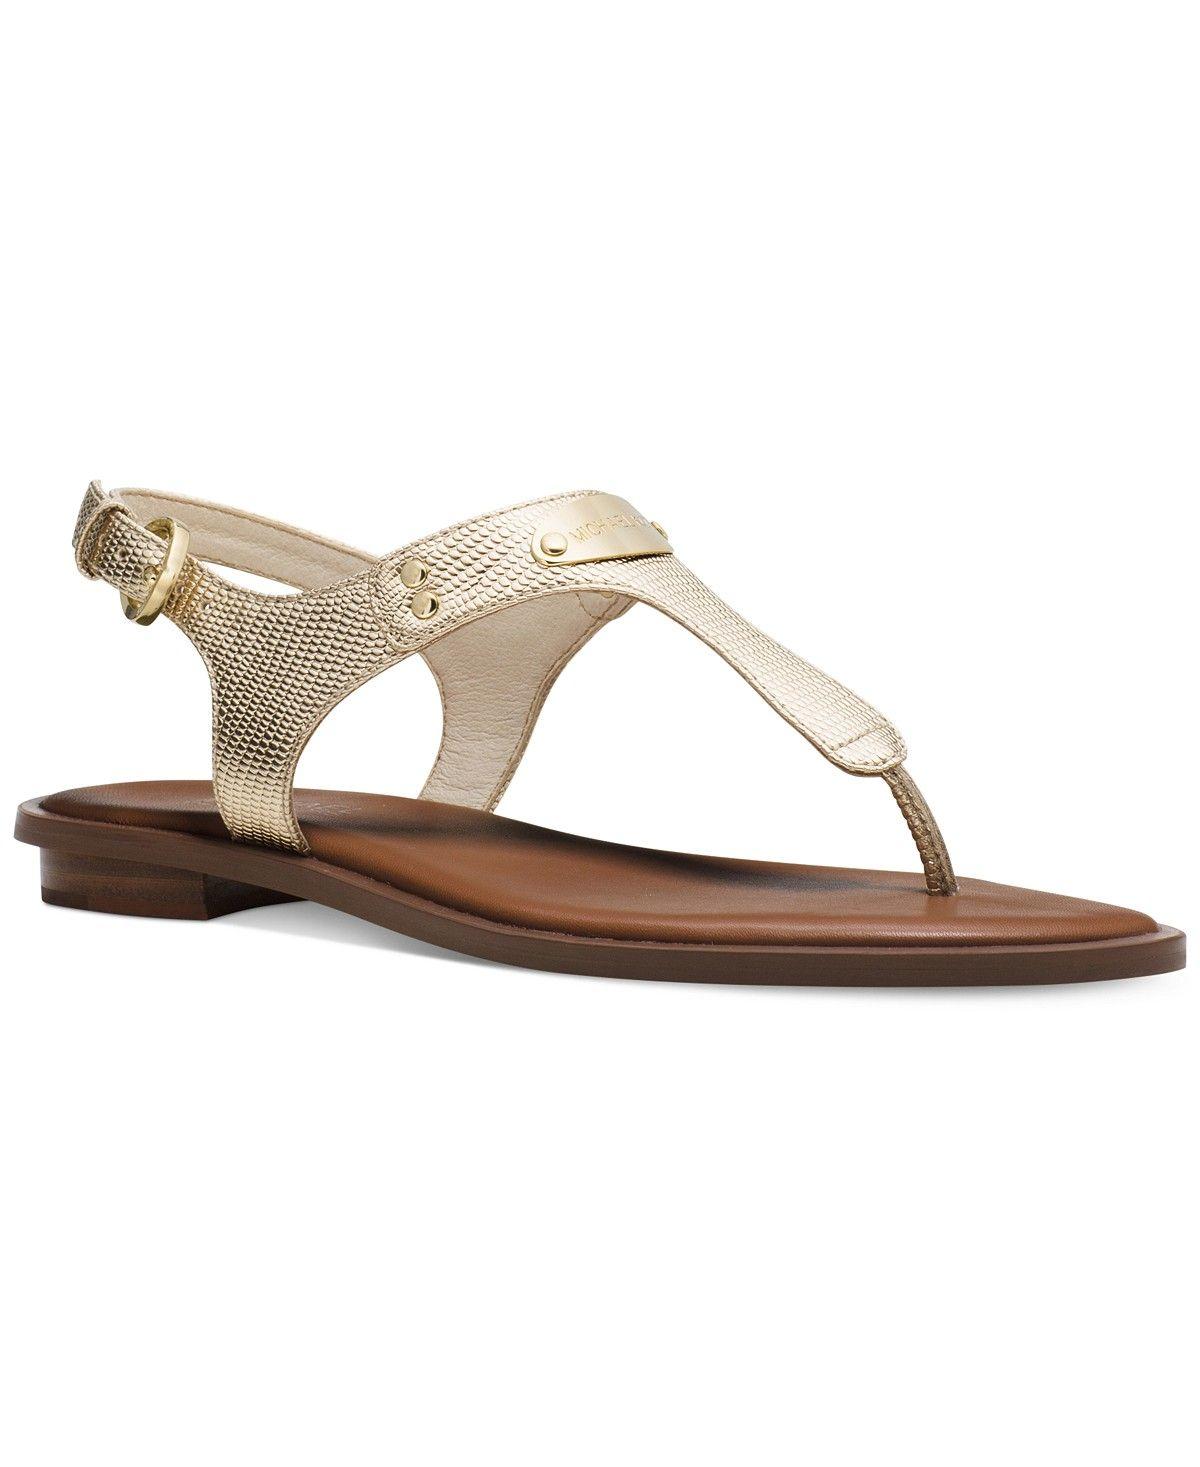 63953bbfe301 MICHAEL Michael Kors MK Plate Flat Thong Sandals - Michael Kors Sandals -  Shoes - Macy s